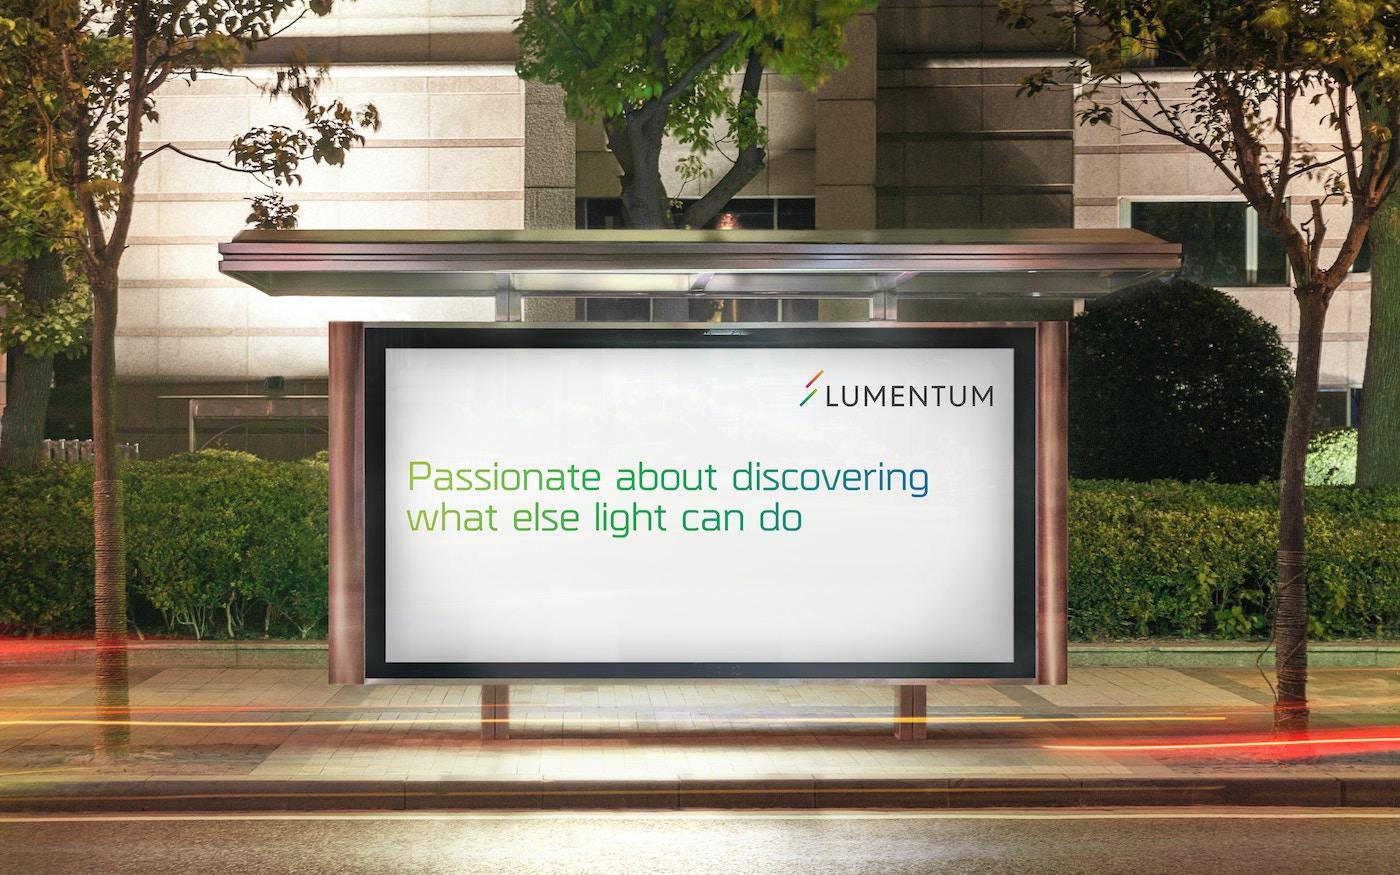 Lumentum advertisement